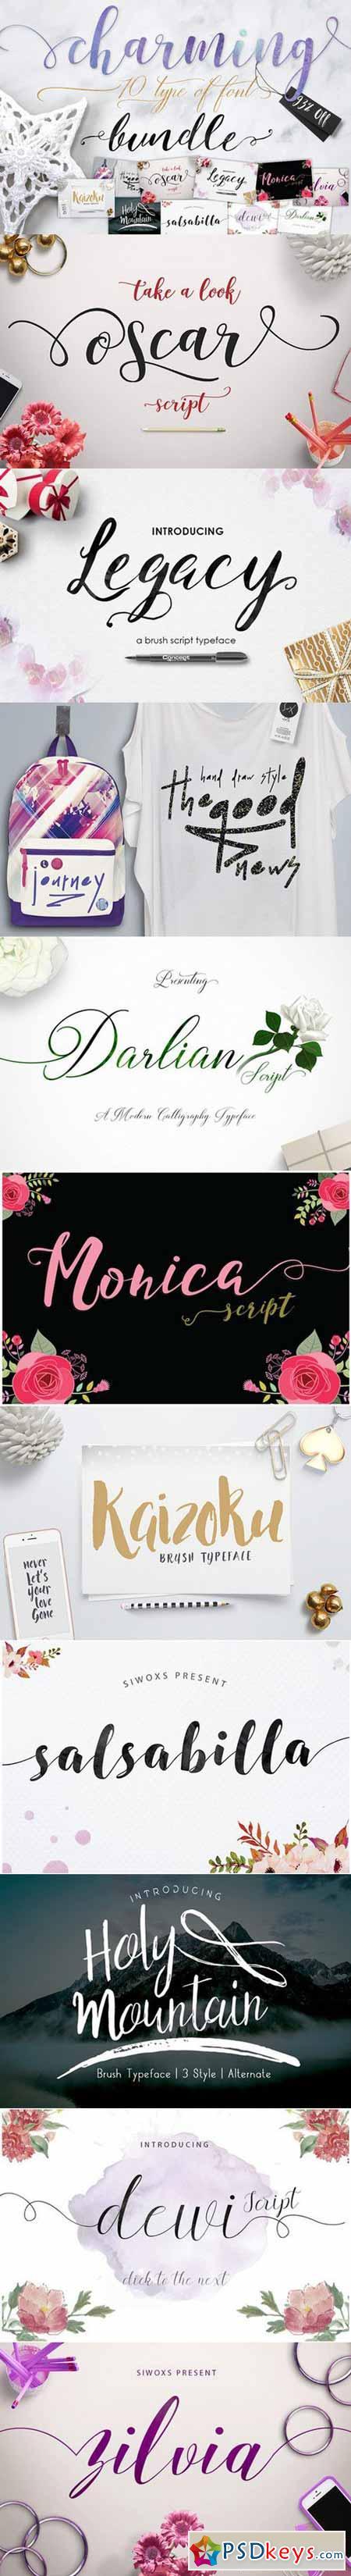 Charming Font Bundle 590377